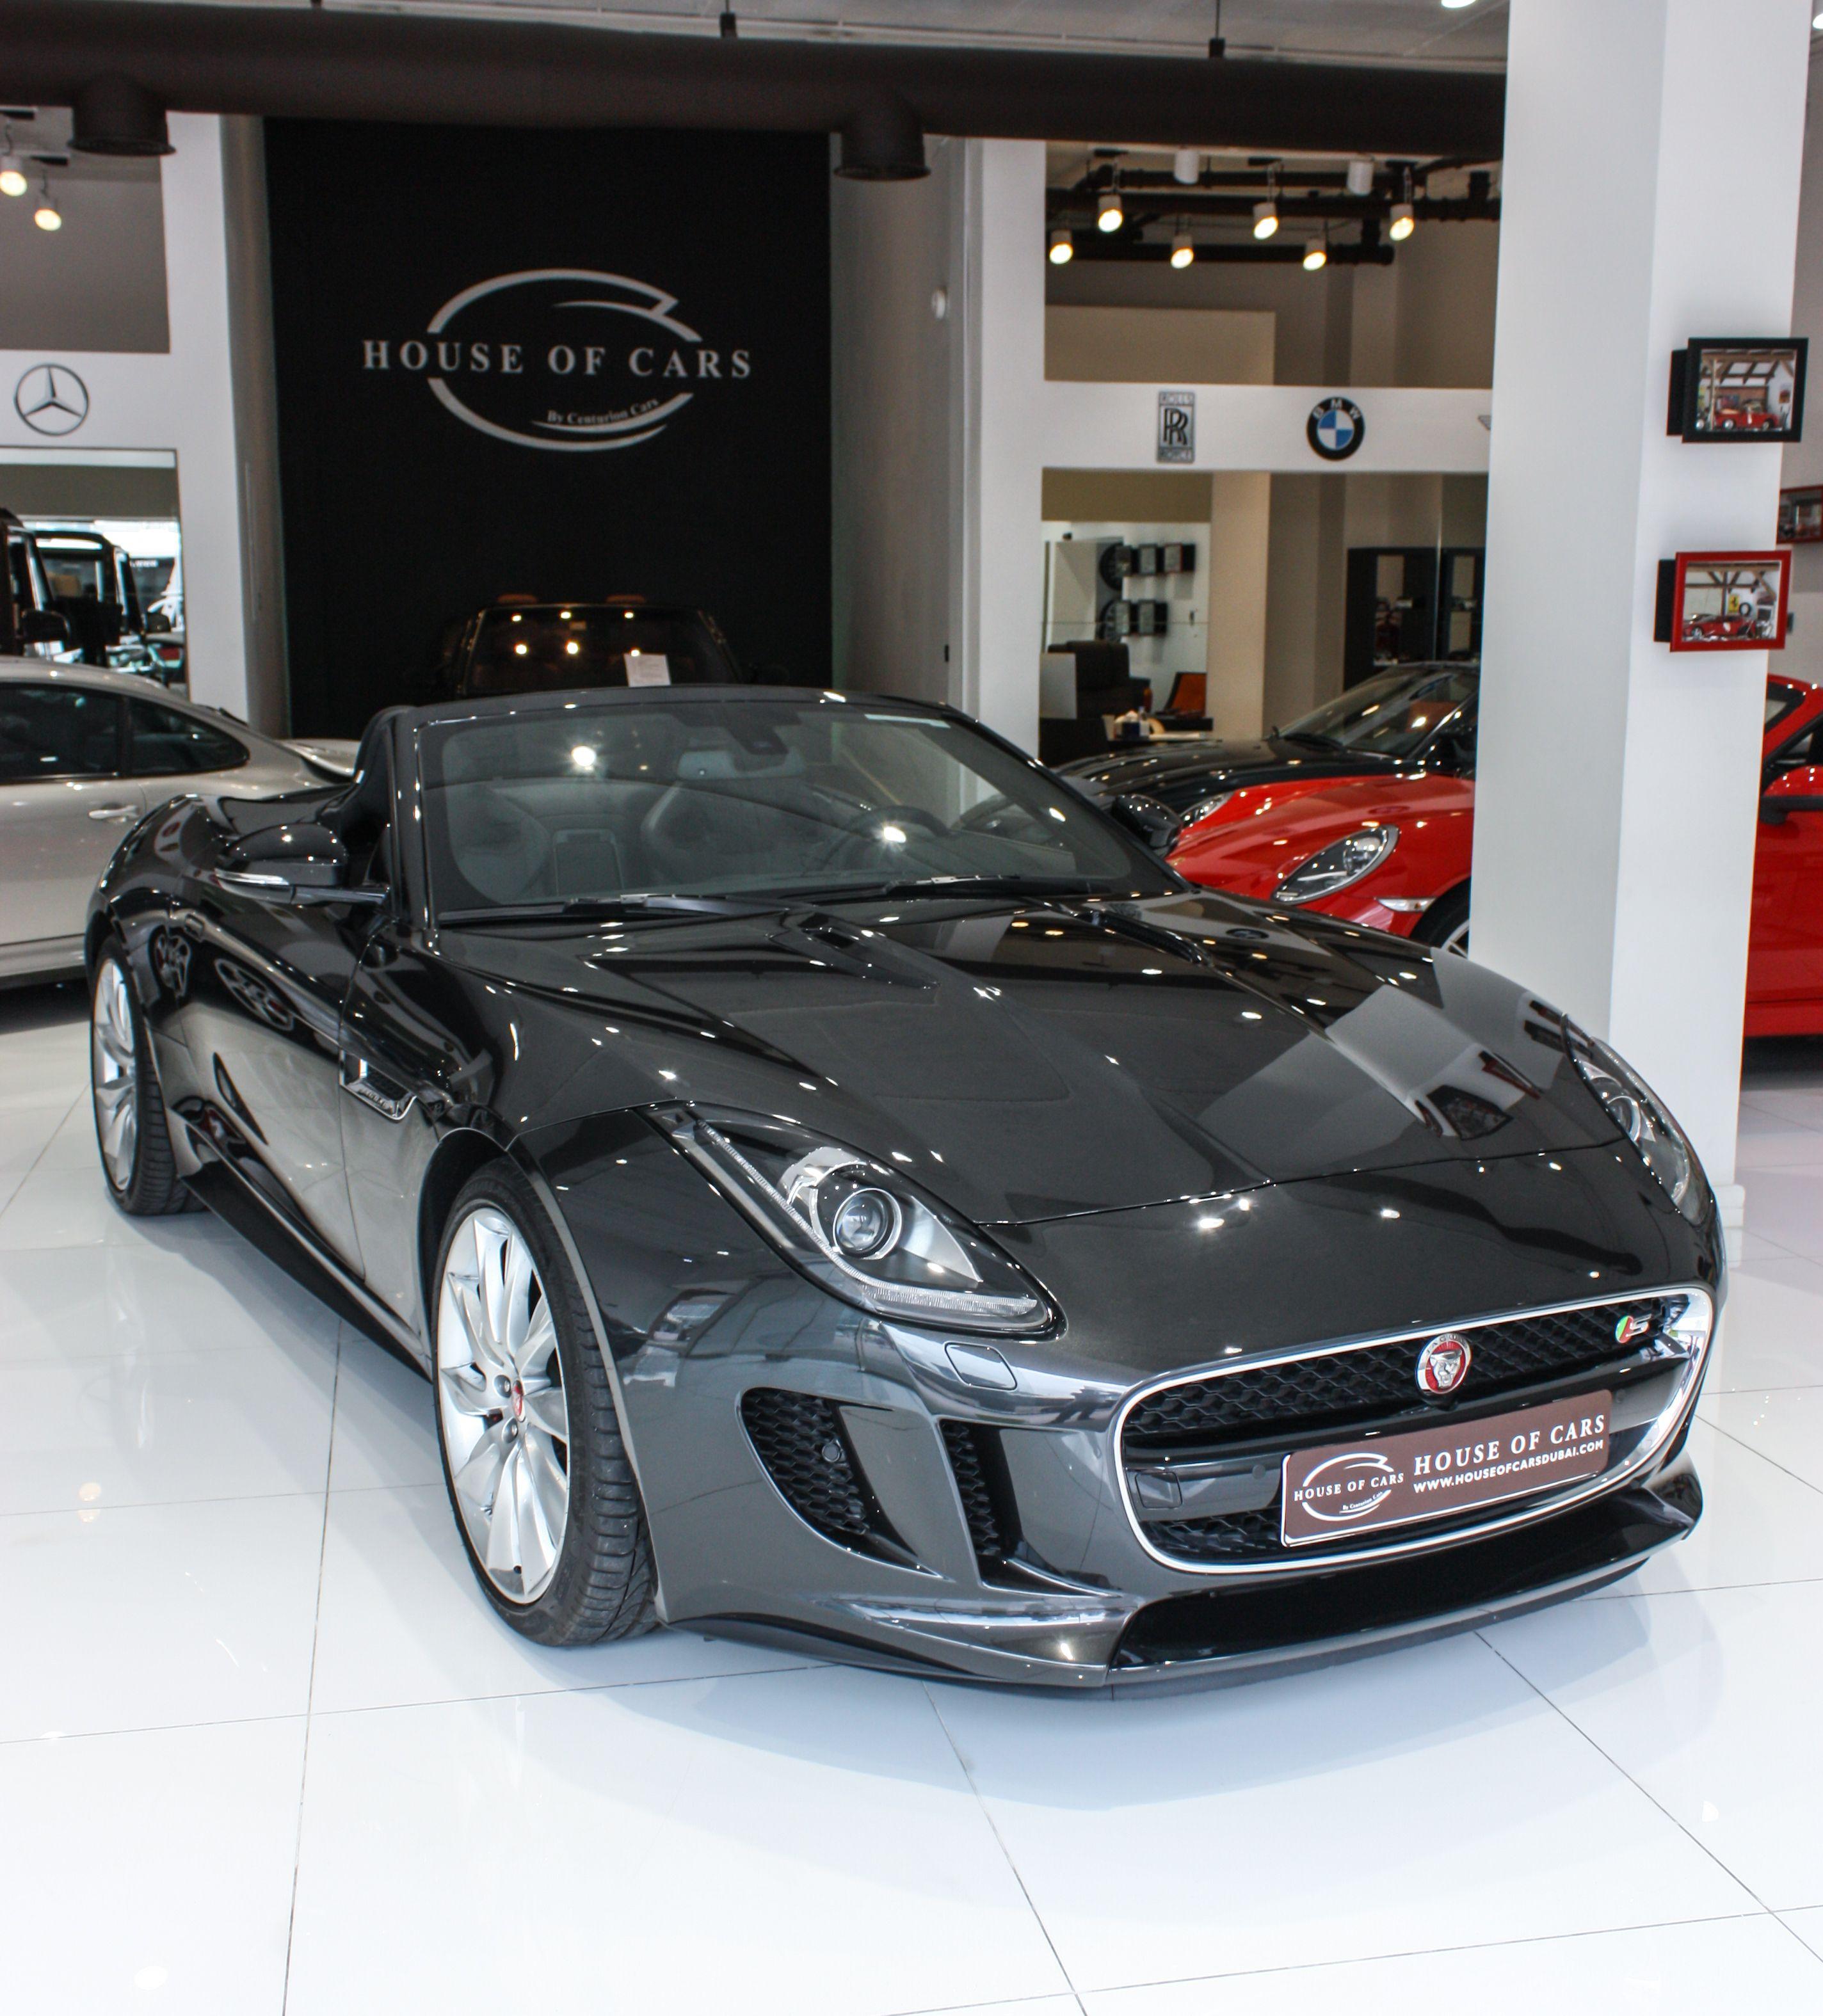 Jaguar F-Type S V8 Convertible 2015 | Brand New | Full Option | Price - 399,950 AED | http://bit.ly/1JR0YJh